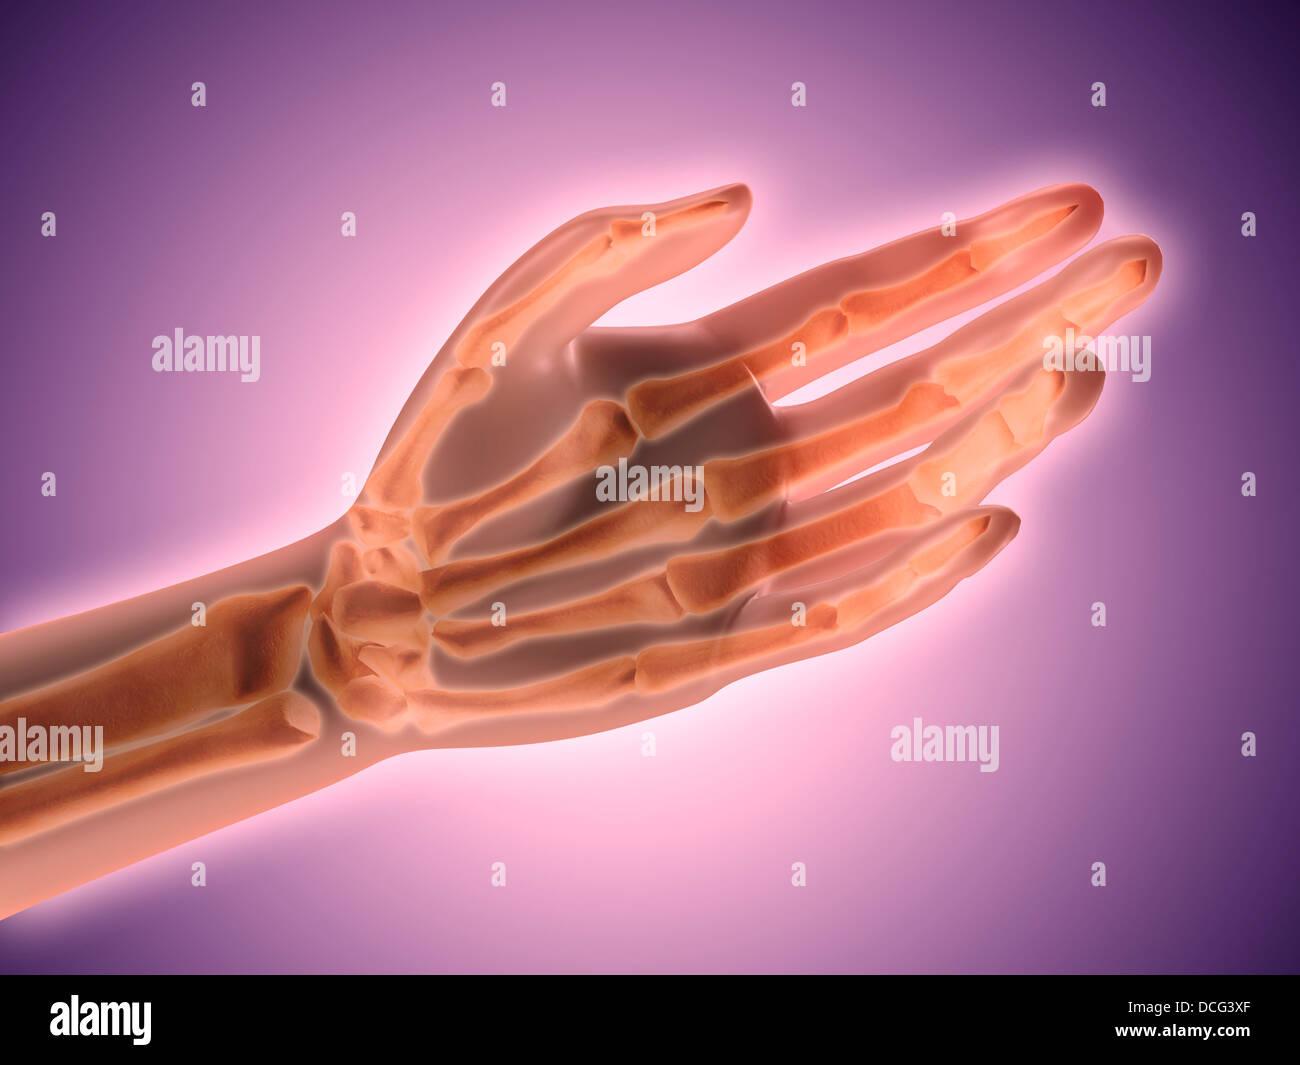 Conceptual image of bones in human hand. - Stock Image